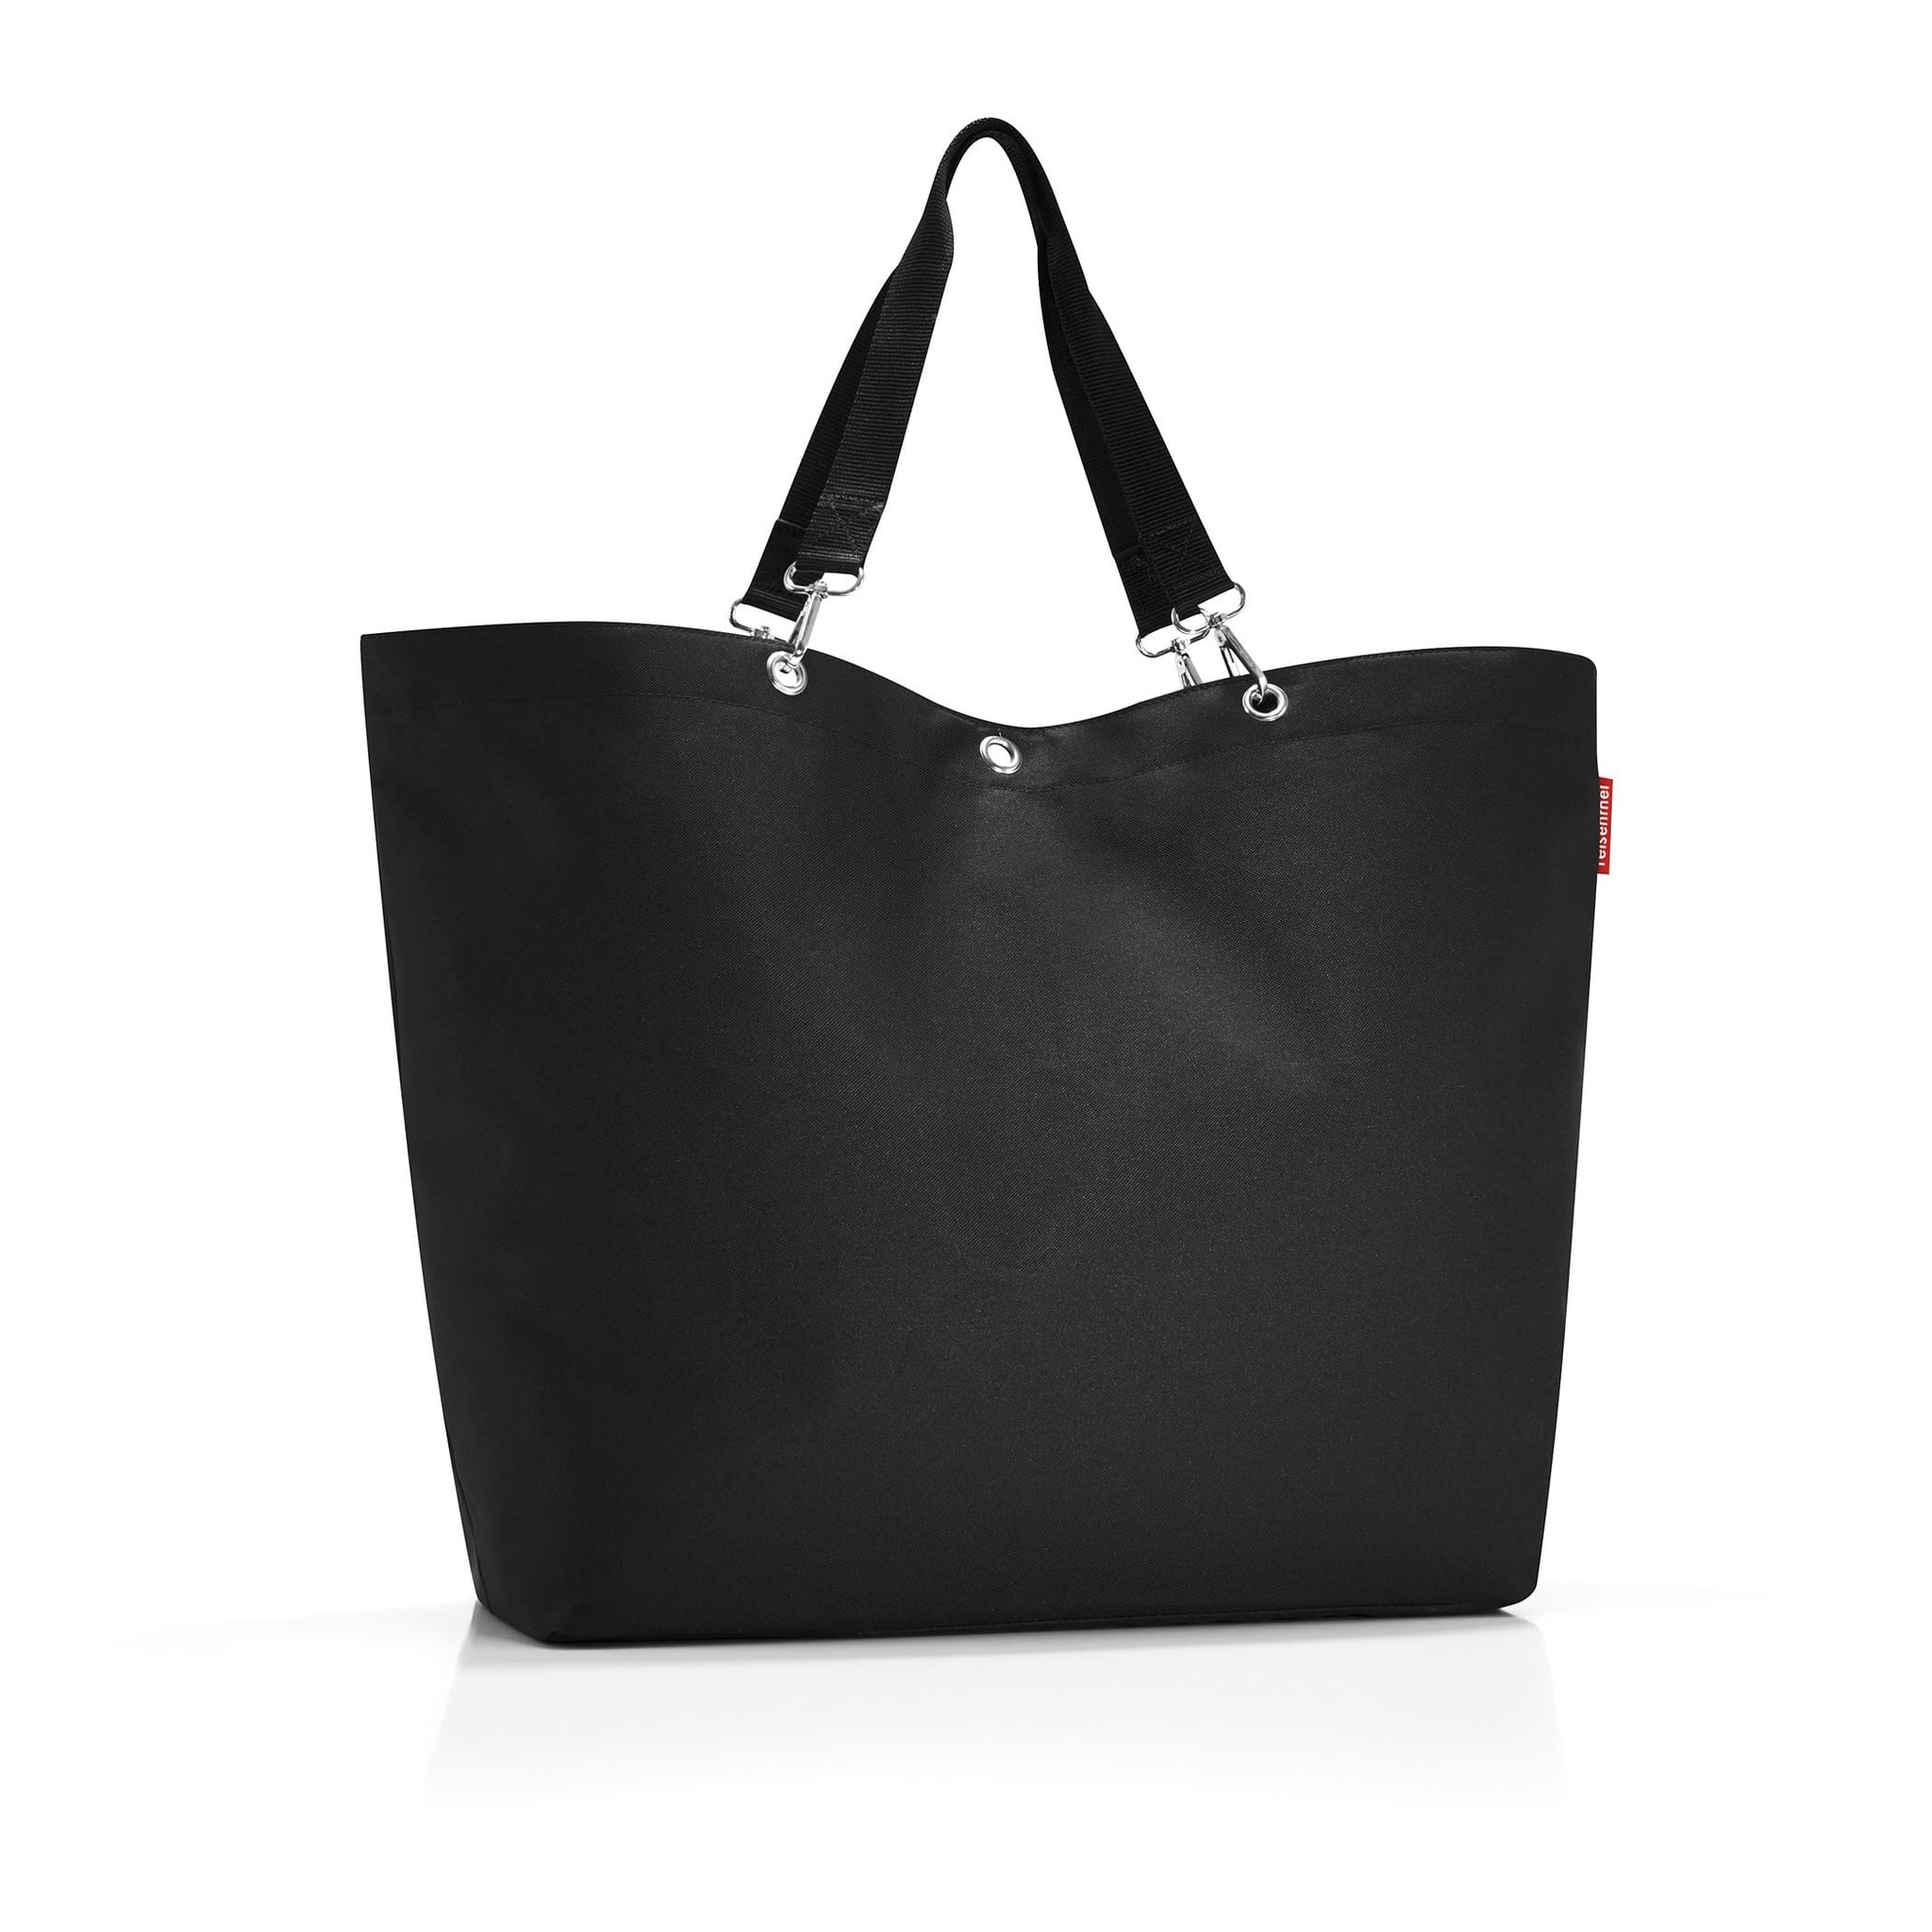 Reisenthel Shopper XL-Strandtas Black